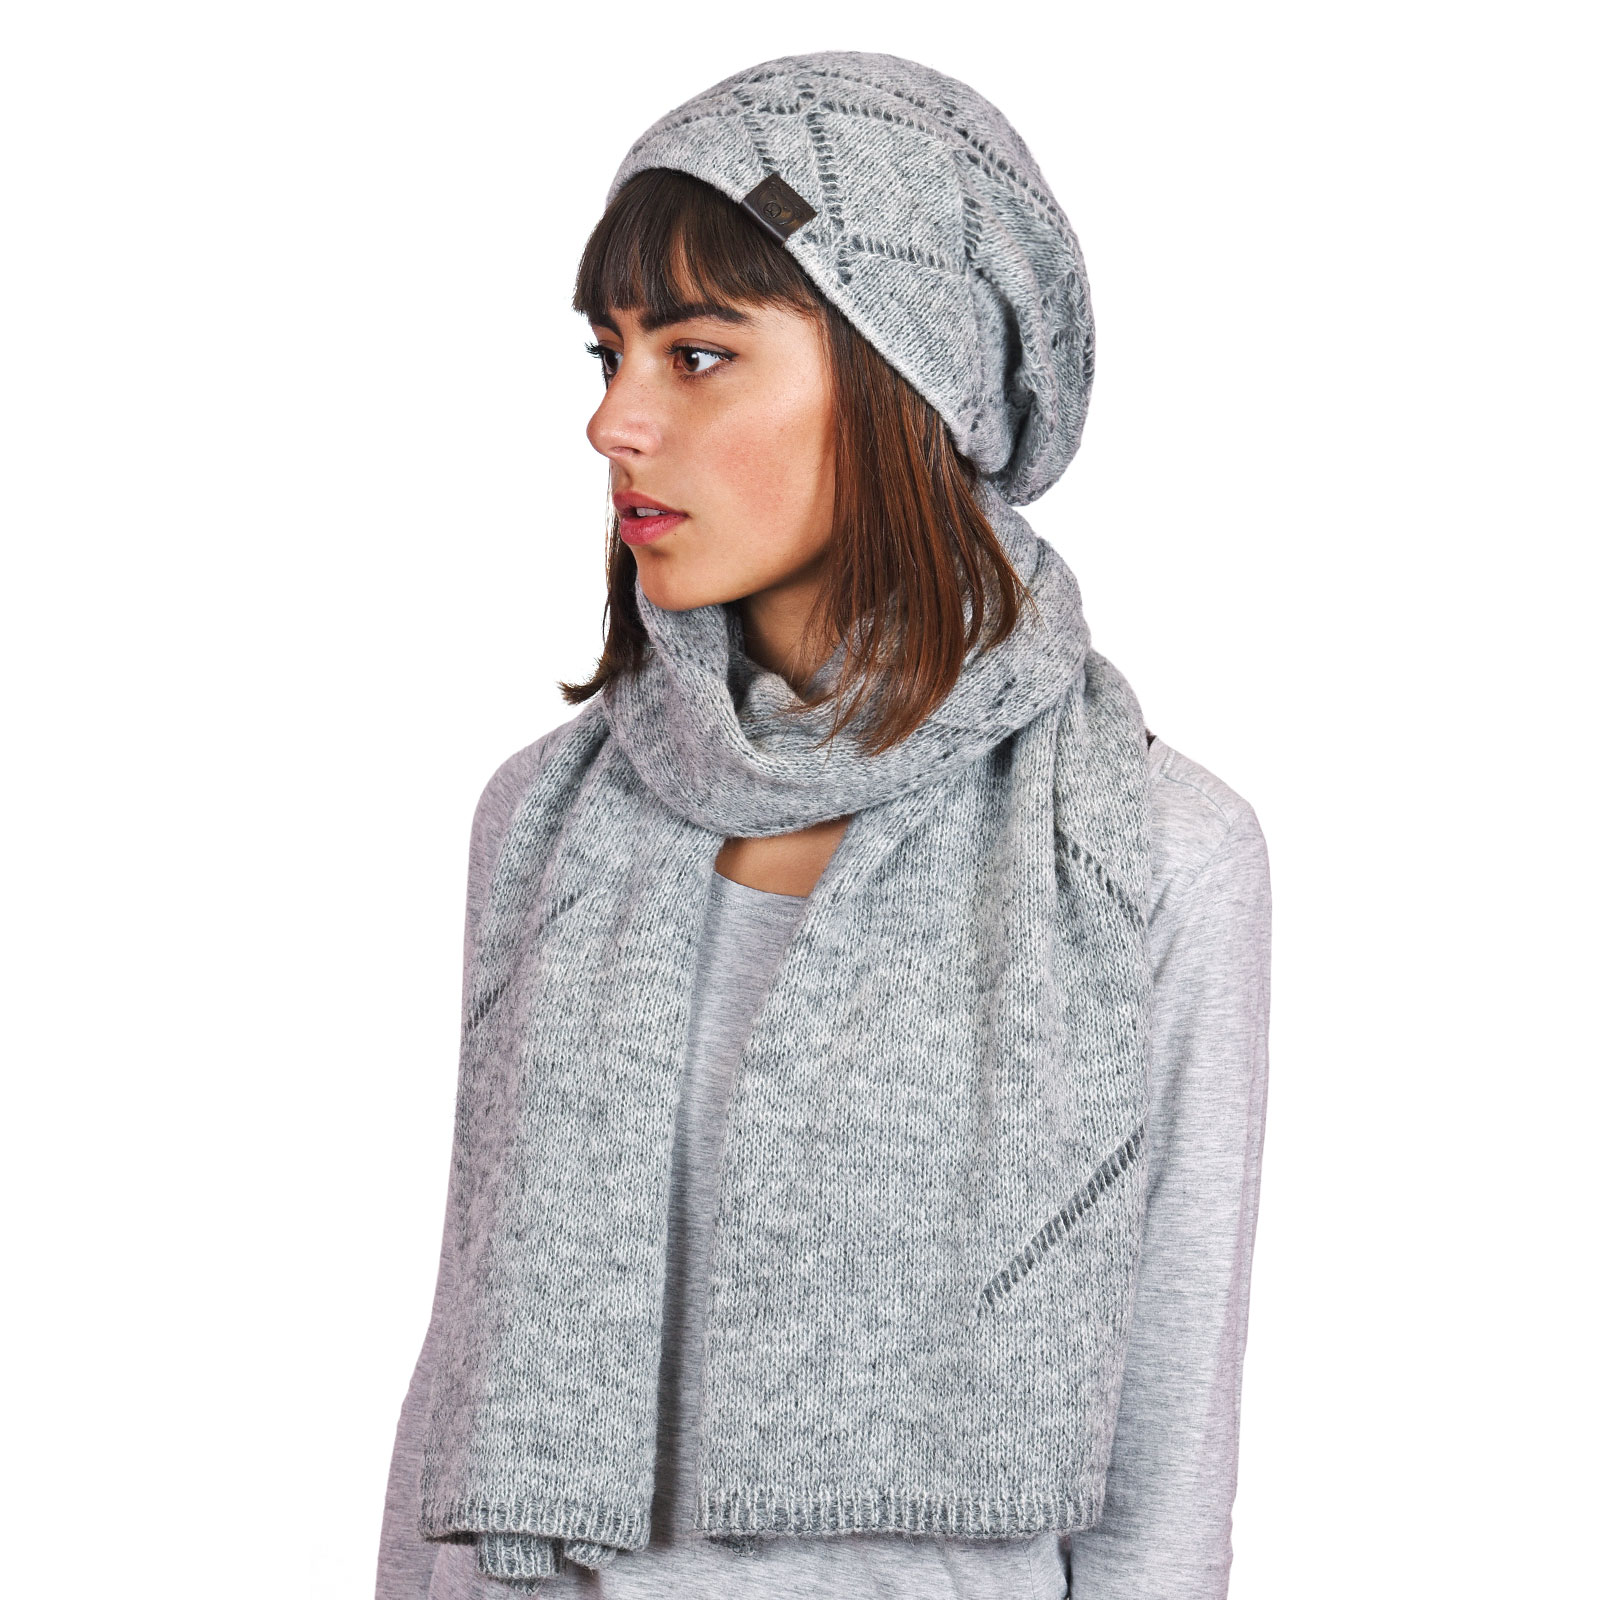 51ec99eae5b54 Echarpe femme et bonnet gris Adama - Made in Europe